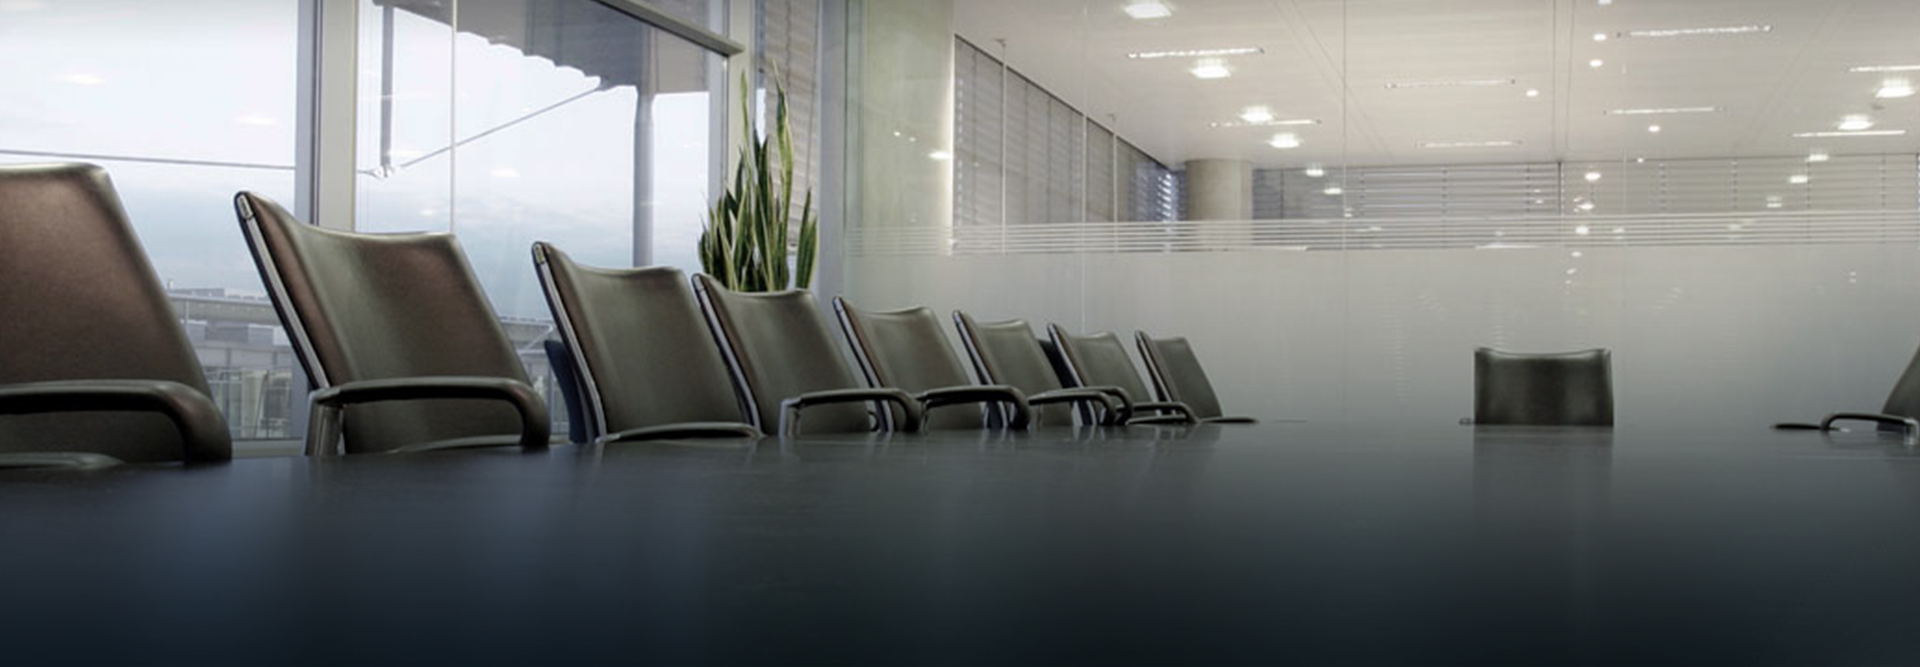 Leadership - Tata Motors